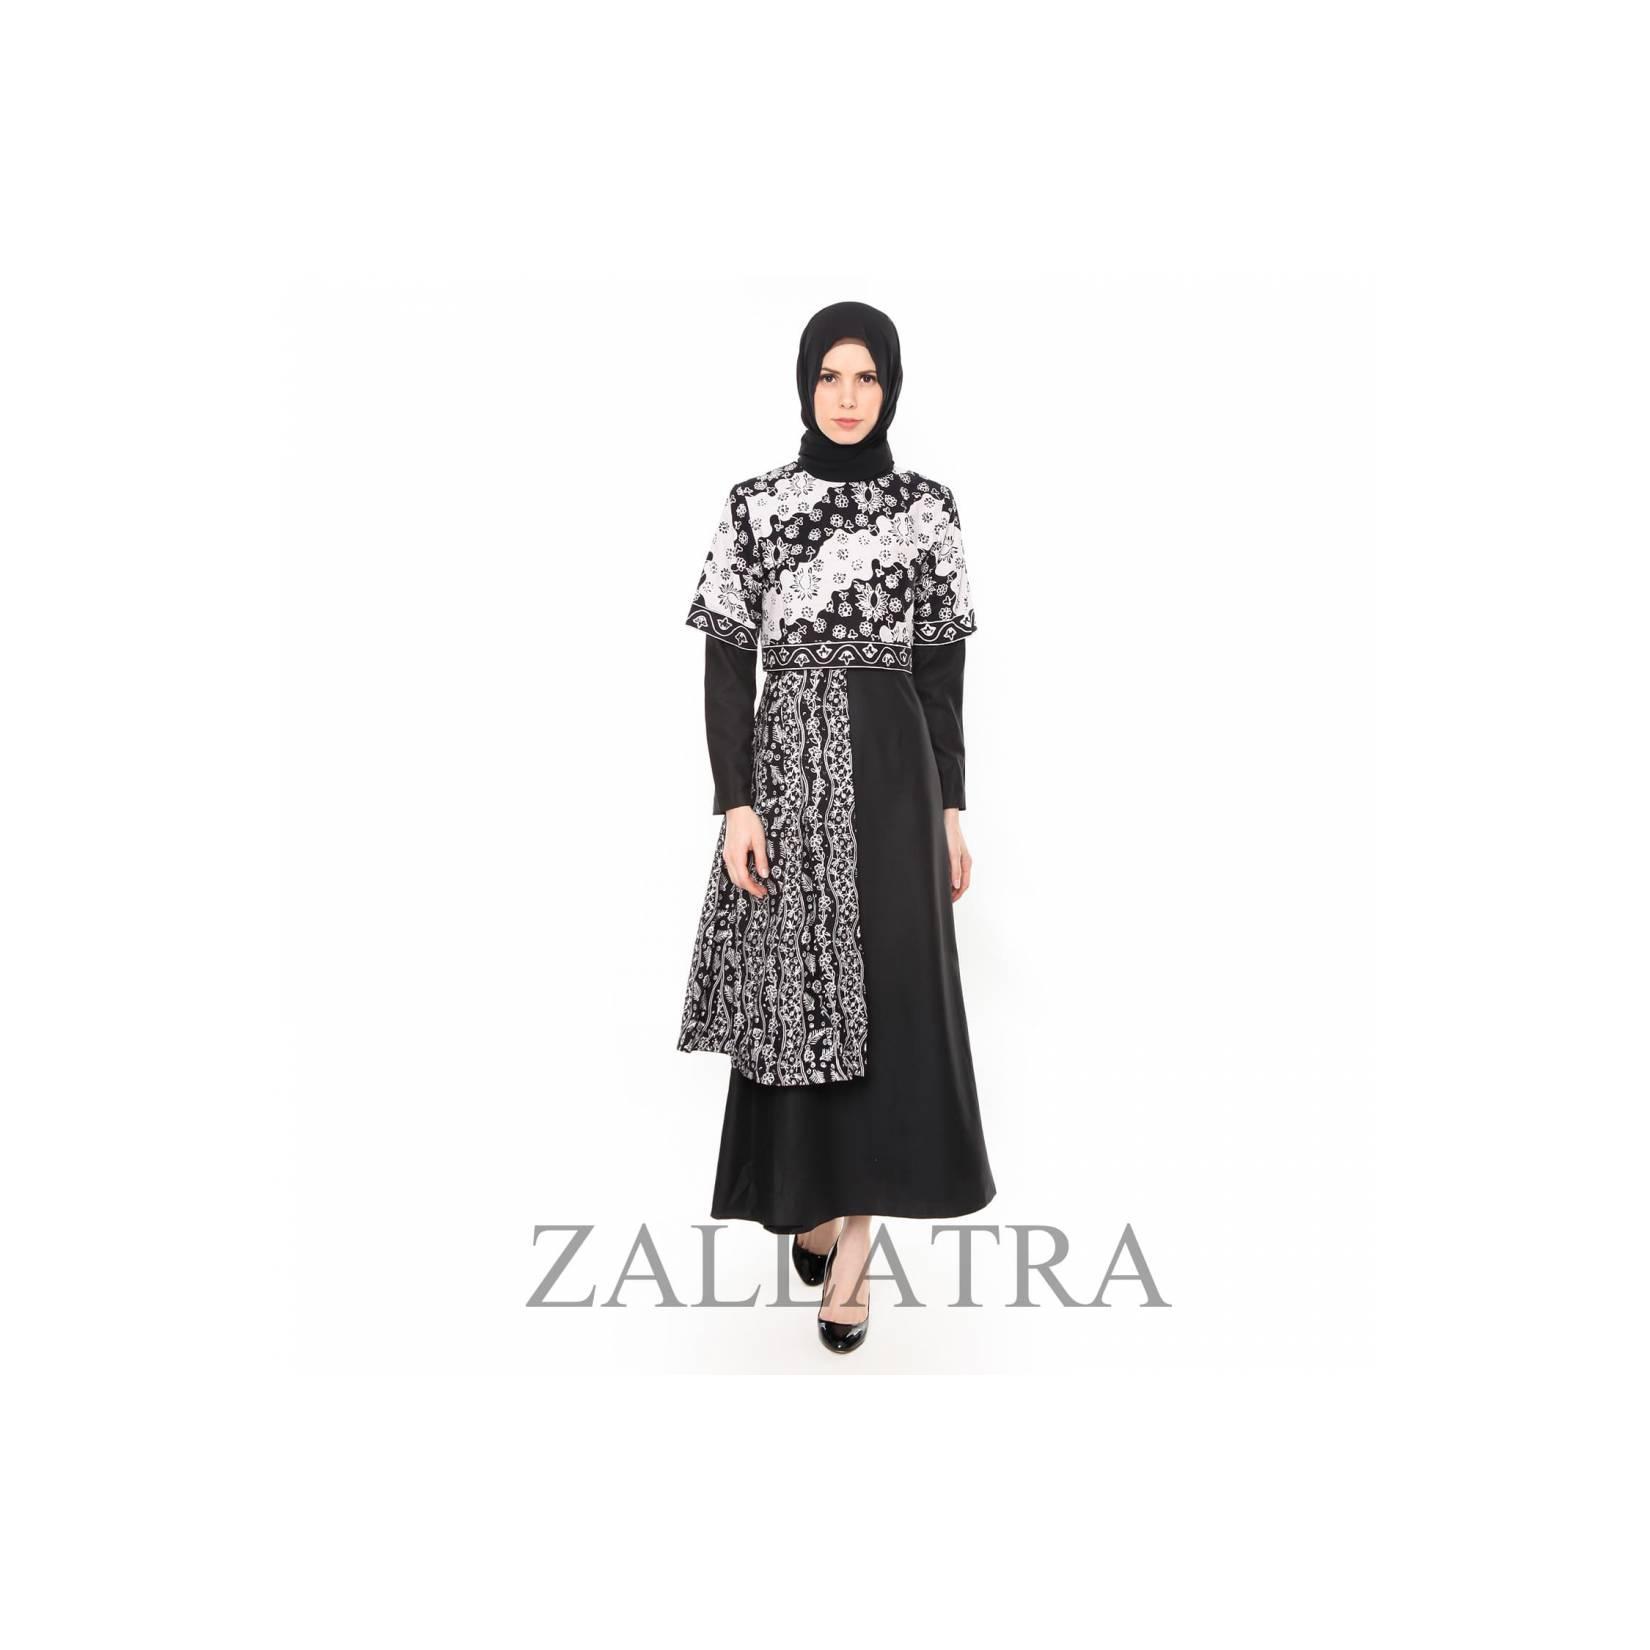 Gamis Batik Wanita Asli Jambi Berkualias - Zallatra GM06